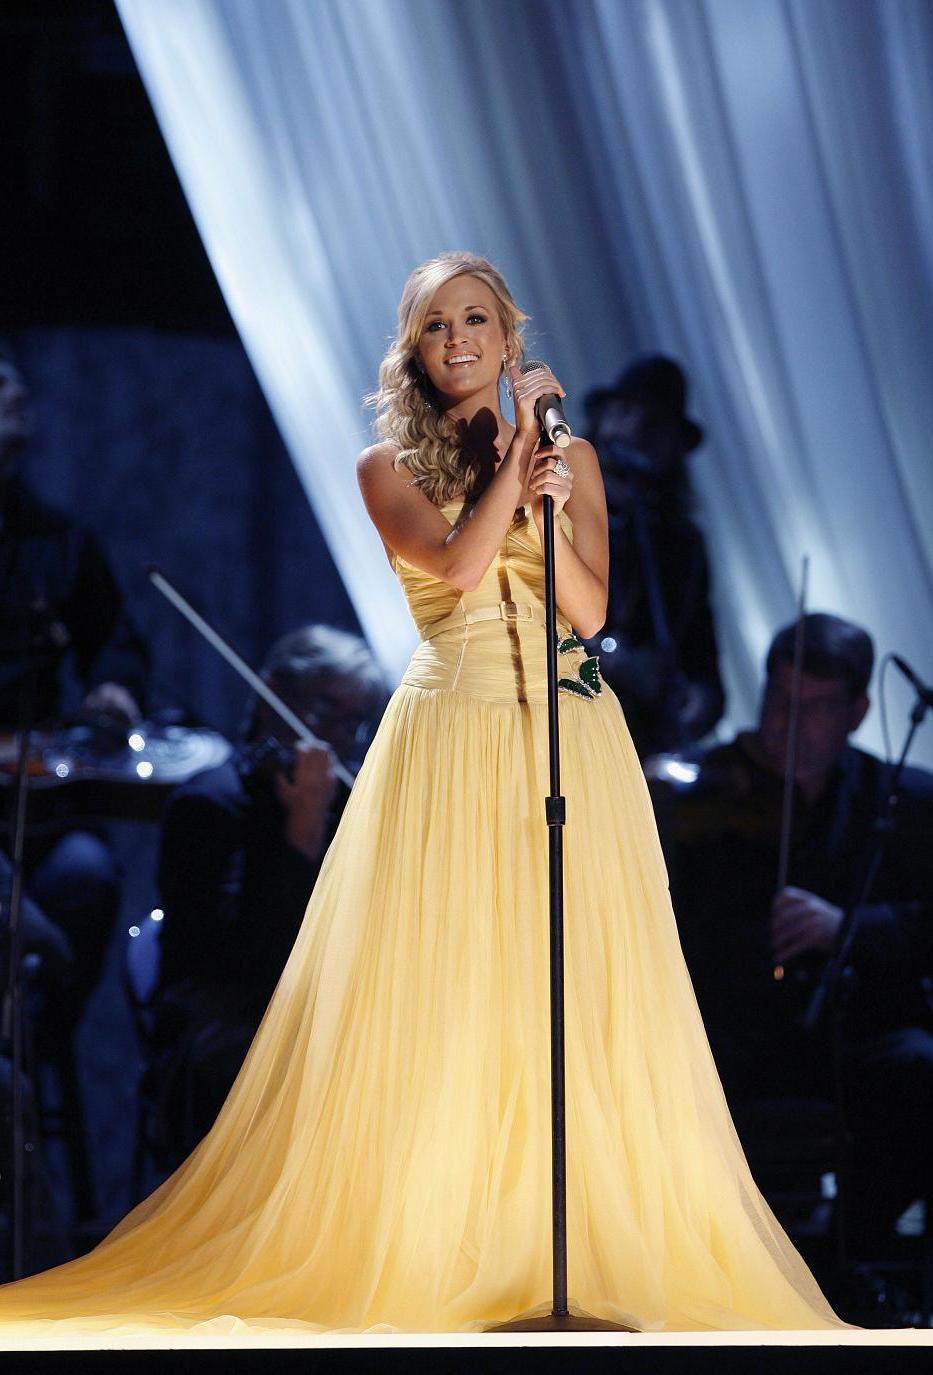 Carrie Underwood, has